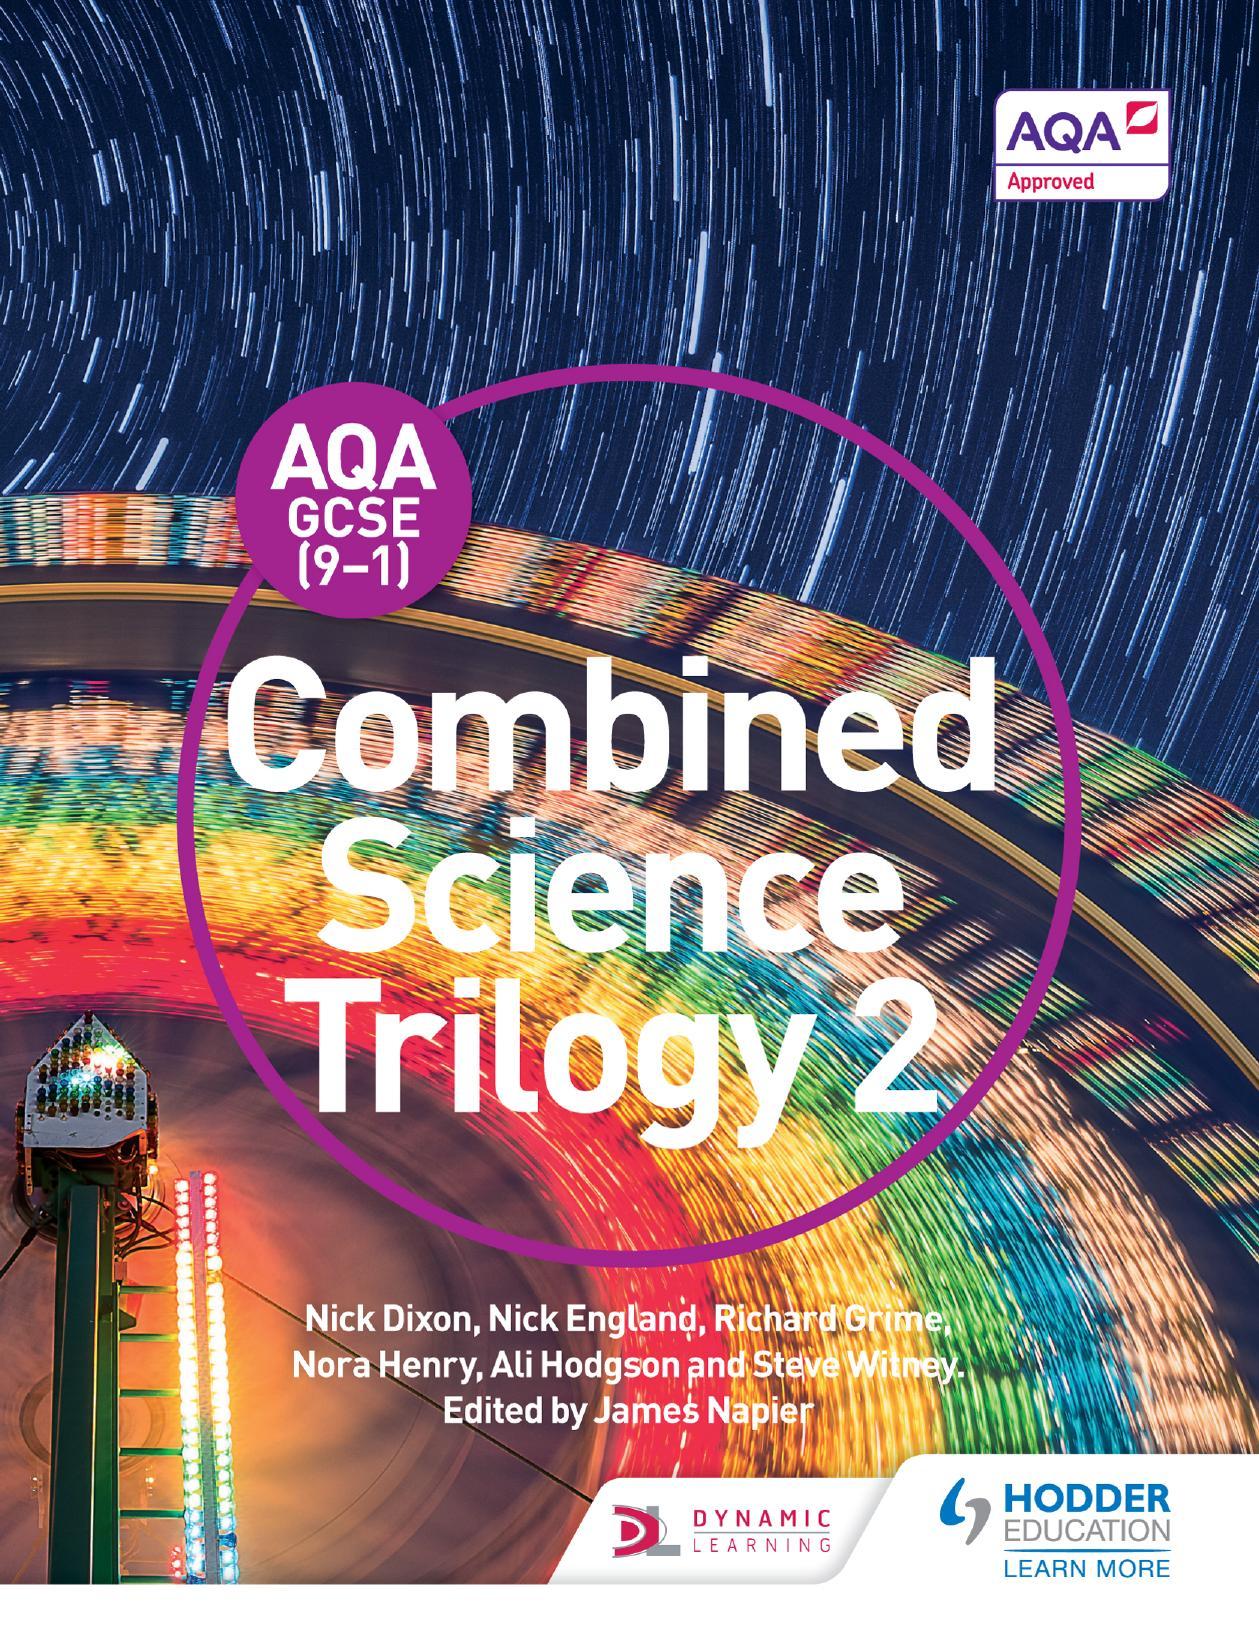 gcse physics textbook pdf download